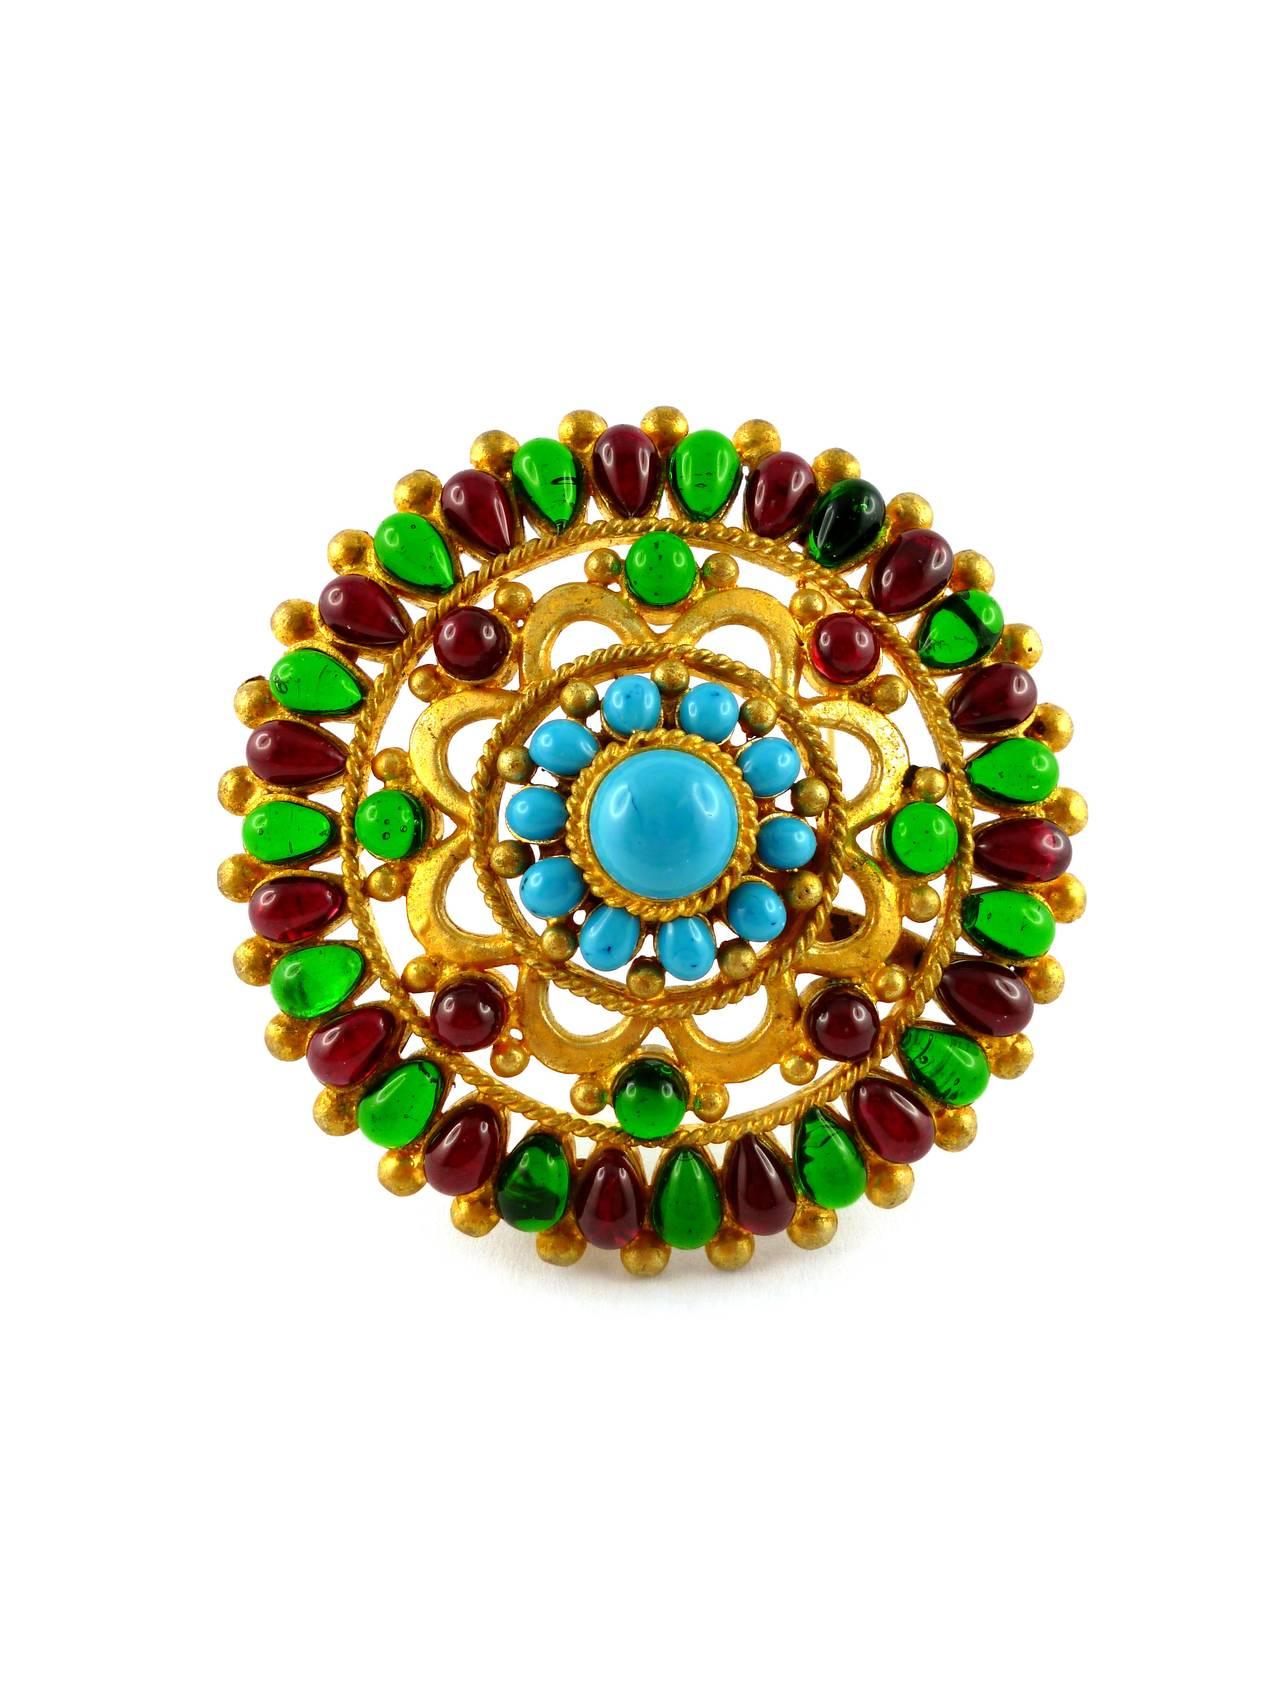 Chanel Massive Gripoix Mughal Brooch Pendant Fall 1993 2